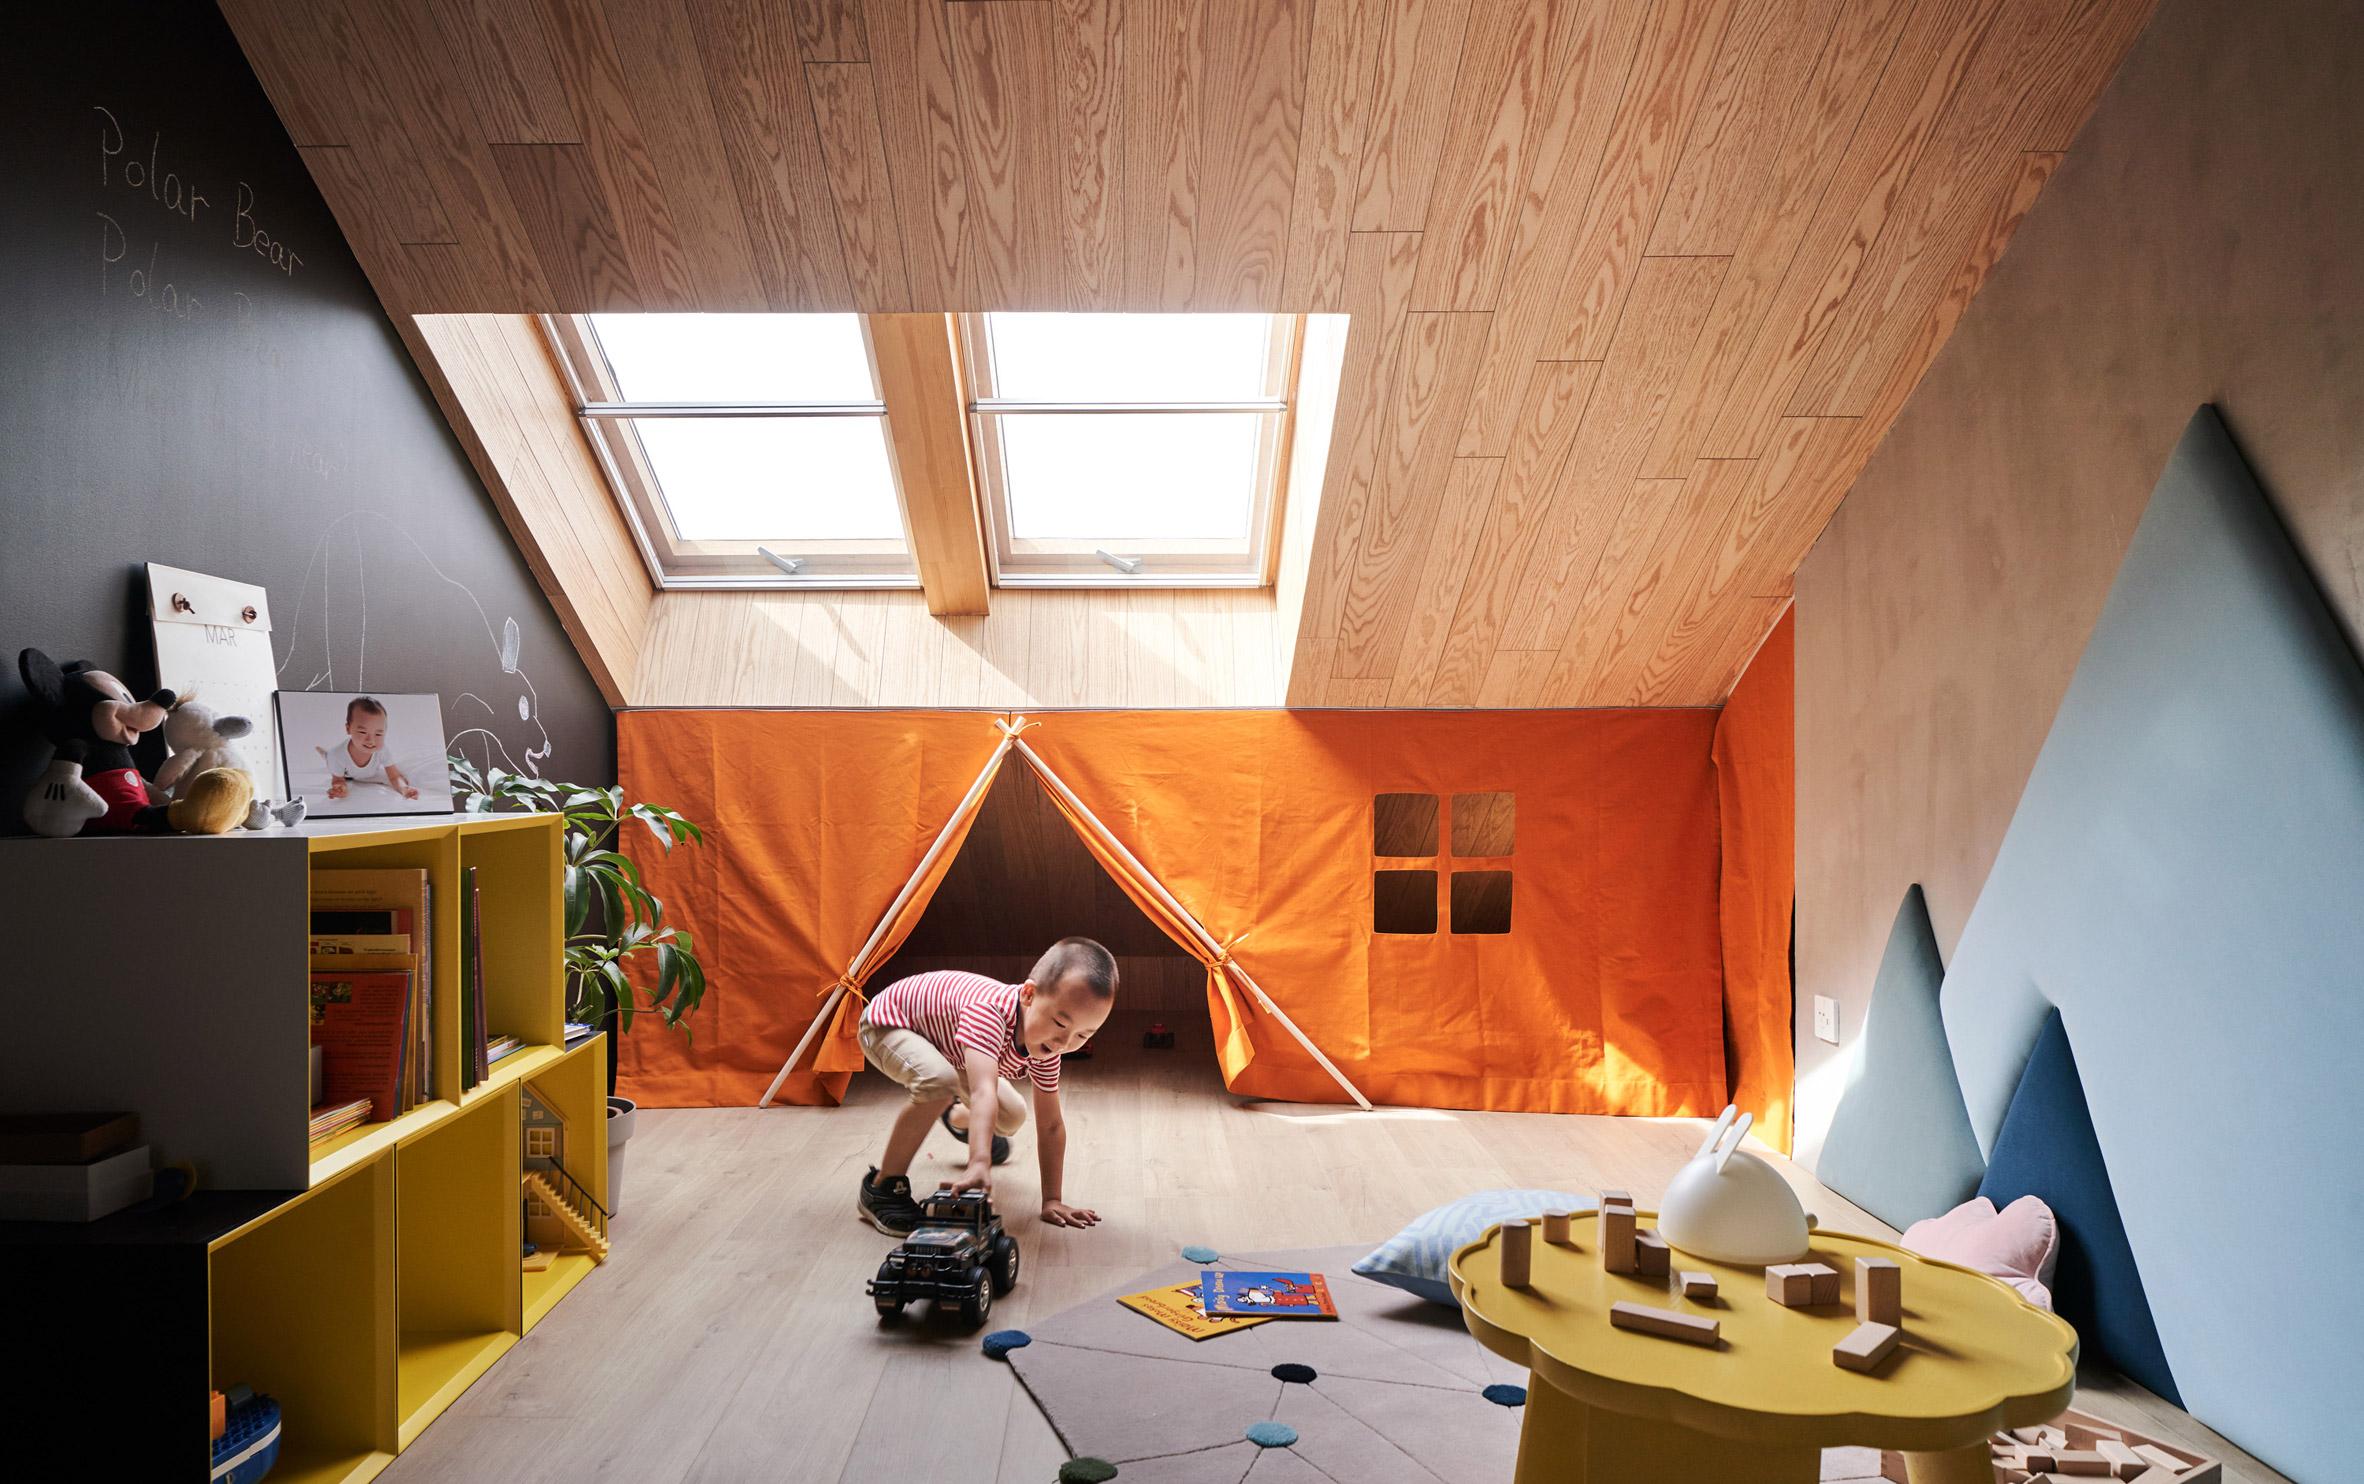 căn hộ cho gia đình trẻ starburst-house-hao-design-interiors-residential-china-beijing-elledecoration vietnam 8